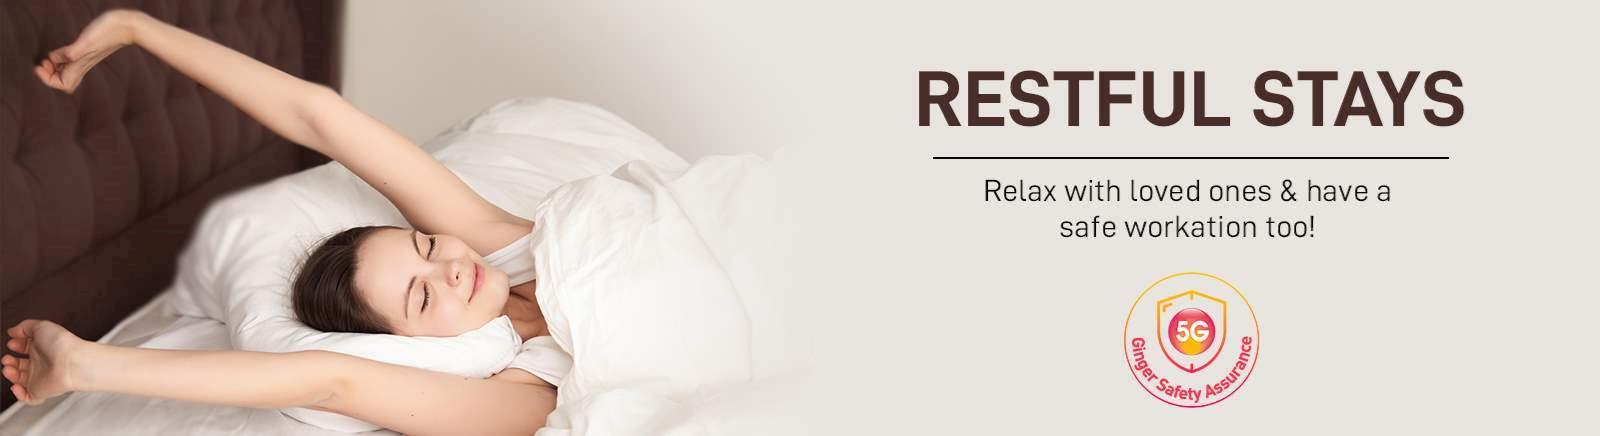 Restful Stays